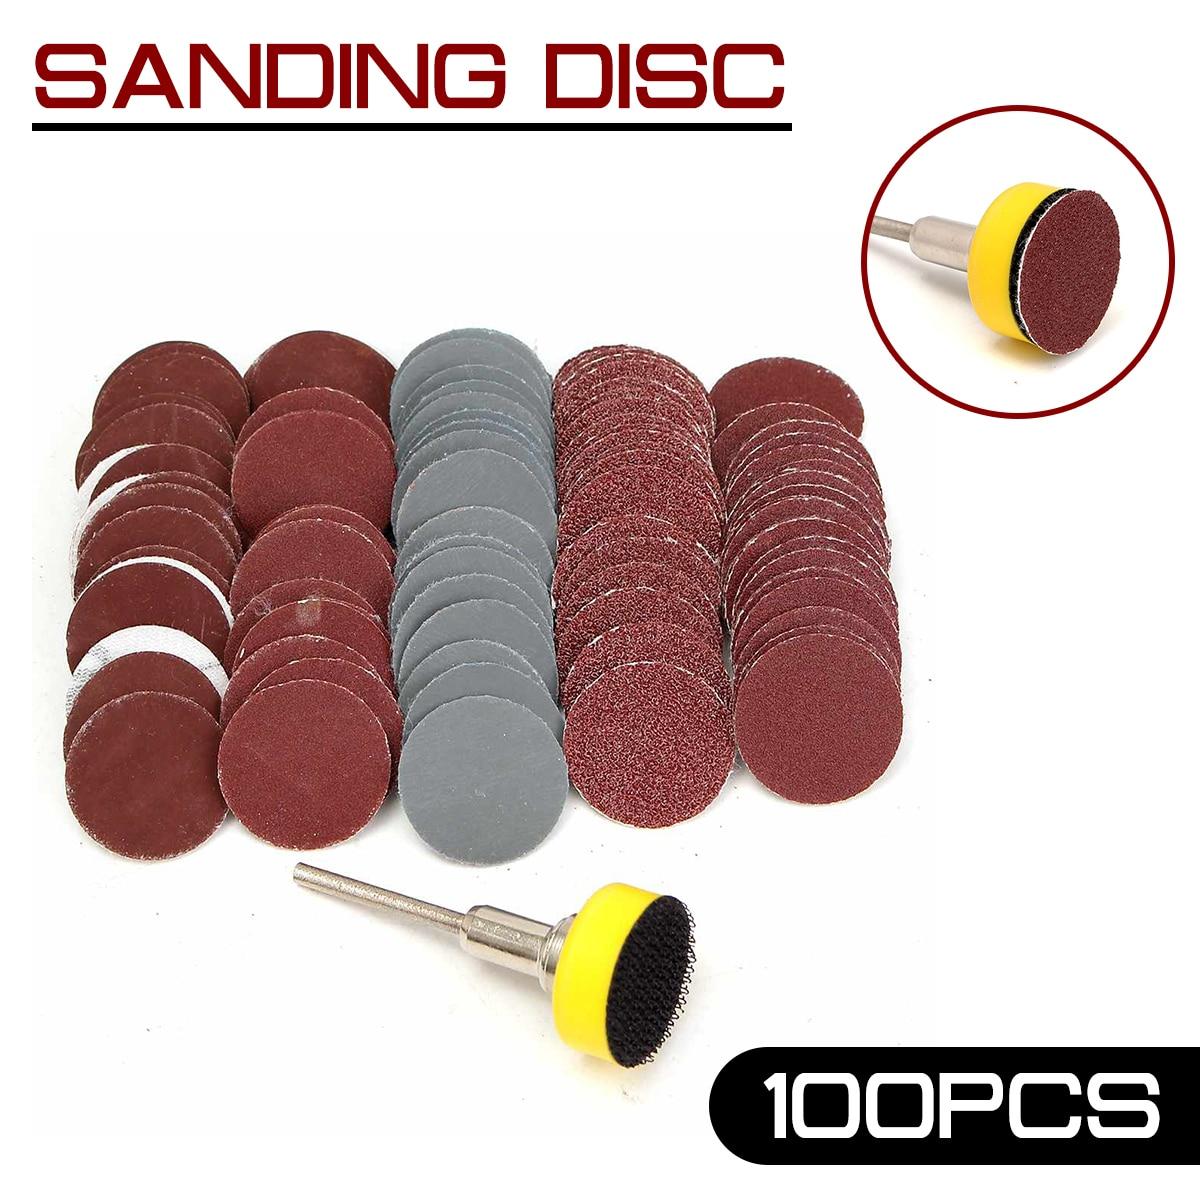 100Pcs 1inch Sanding Disc + Loop Sanding Pad 1inch +1/8inch Shank Abrasives Hook Loop Backer SandPaper Mixed Set